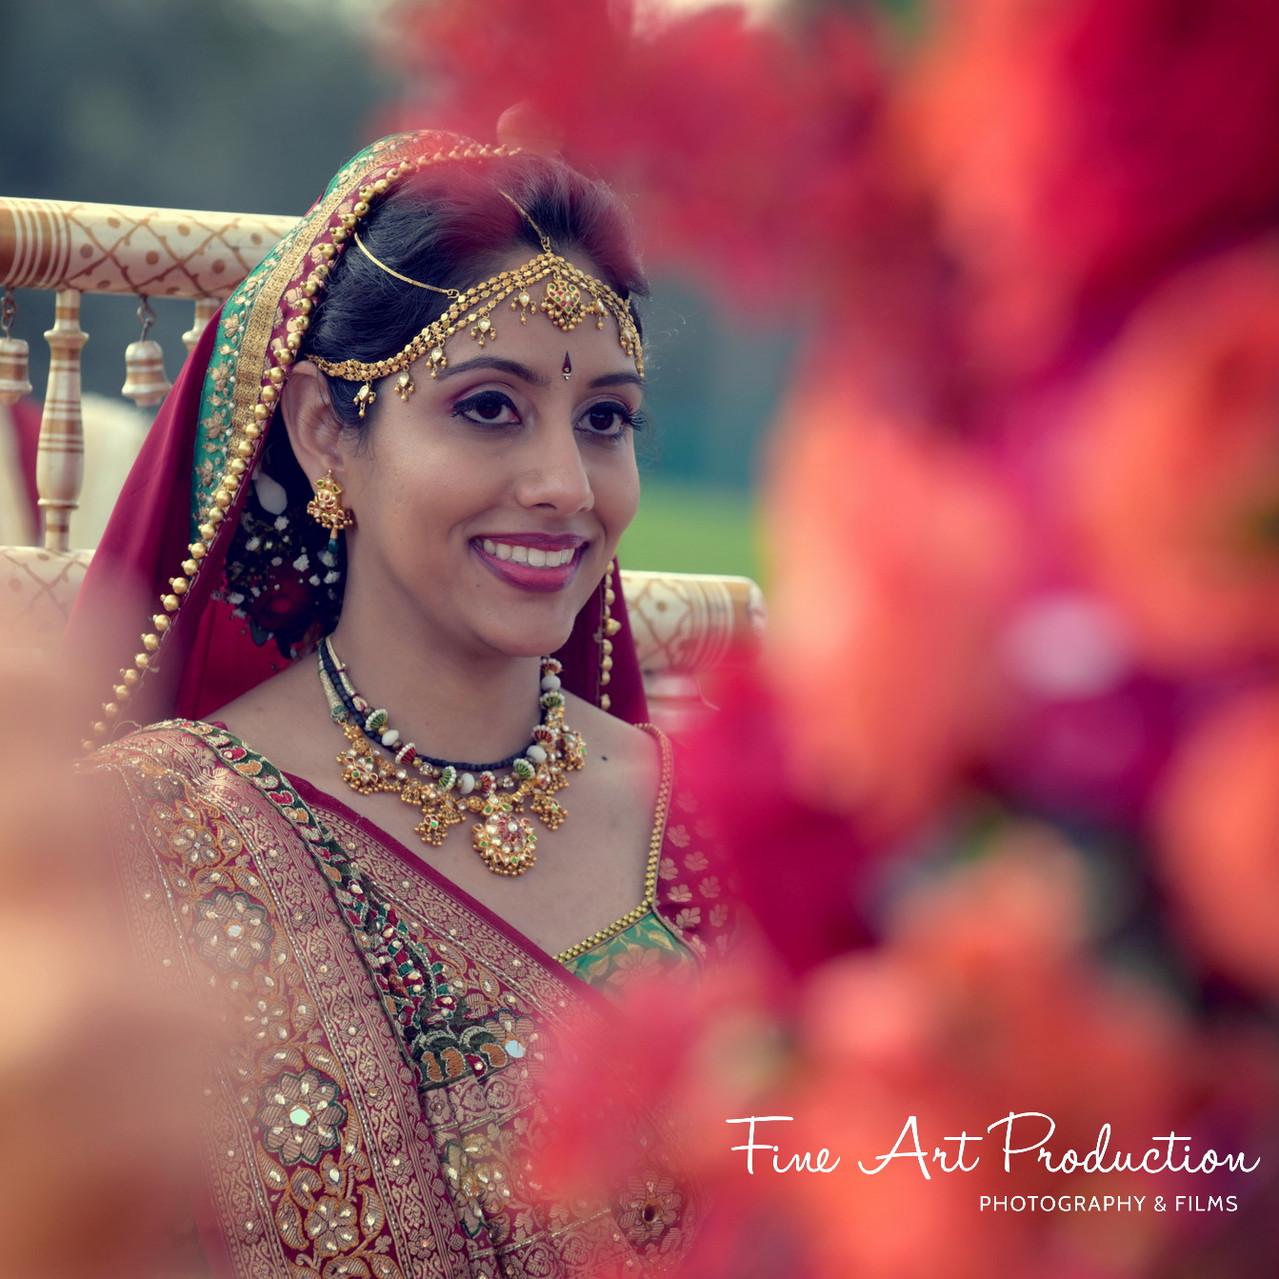 Hyatt-Regency-Grand-Cypress-Indian-Wedding-Photography-Fine-Art-Production-Amish-Thakkar_54